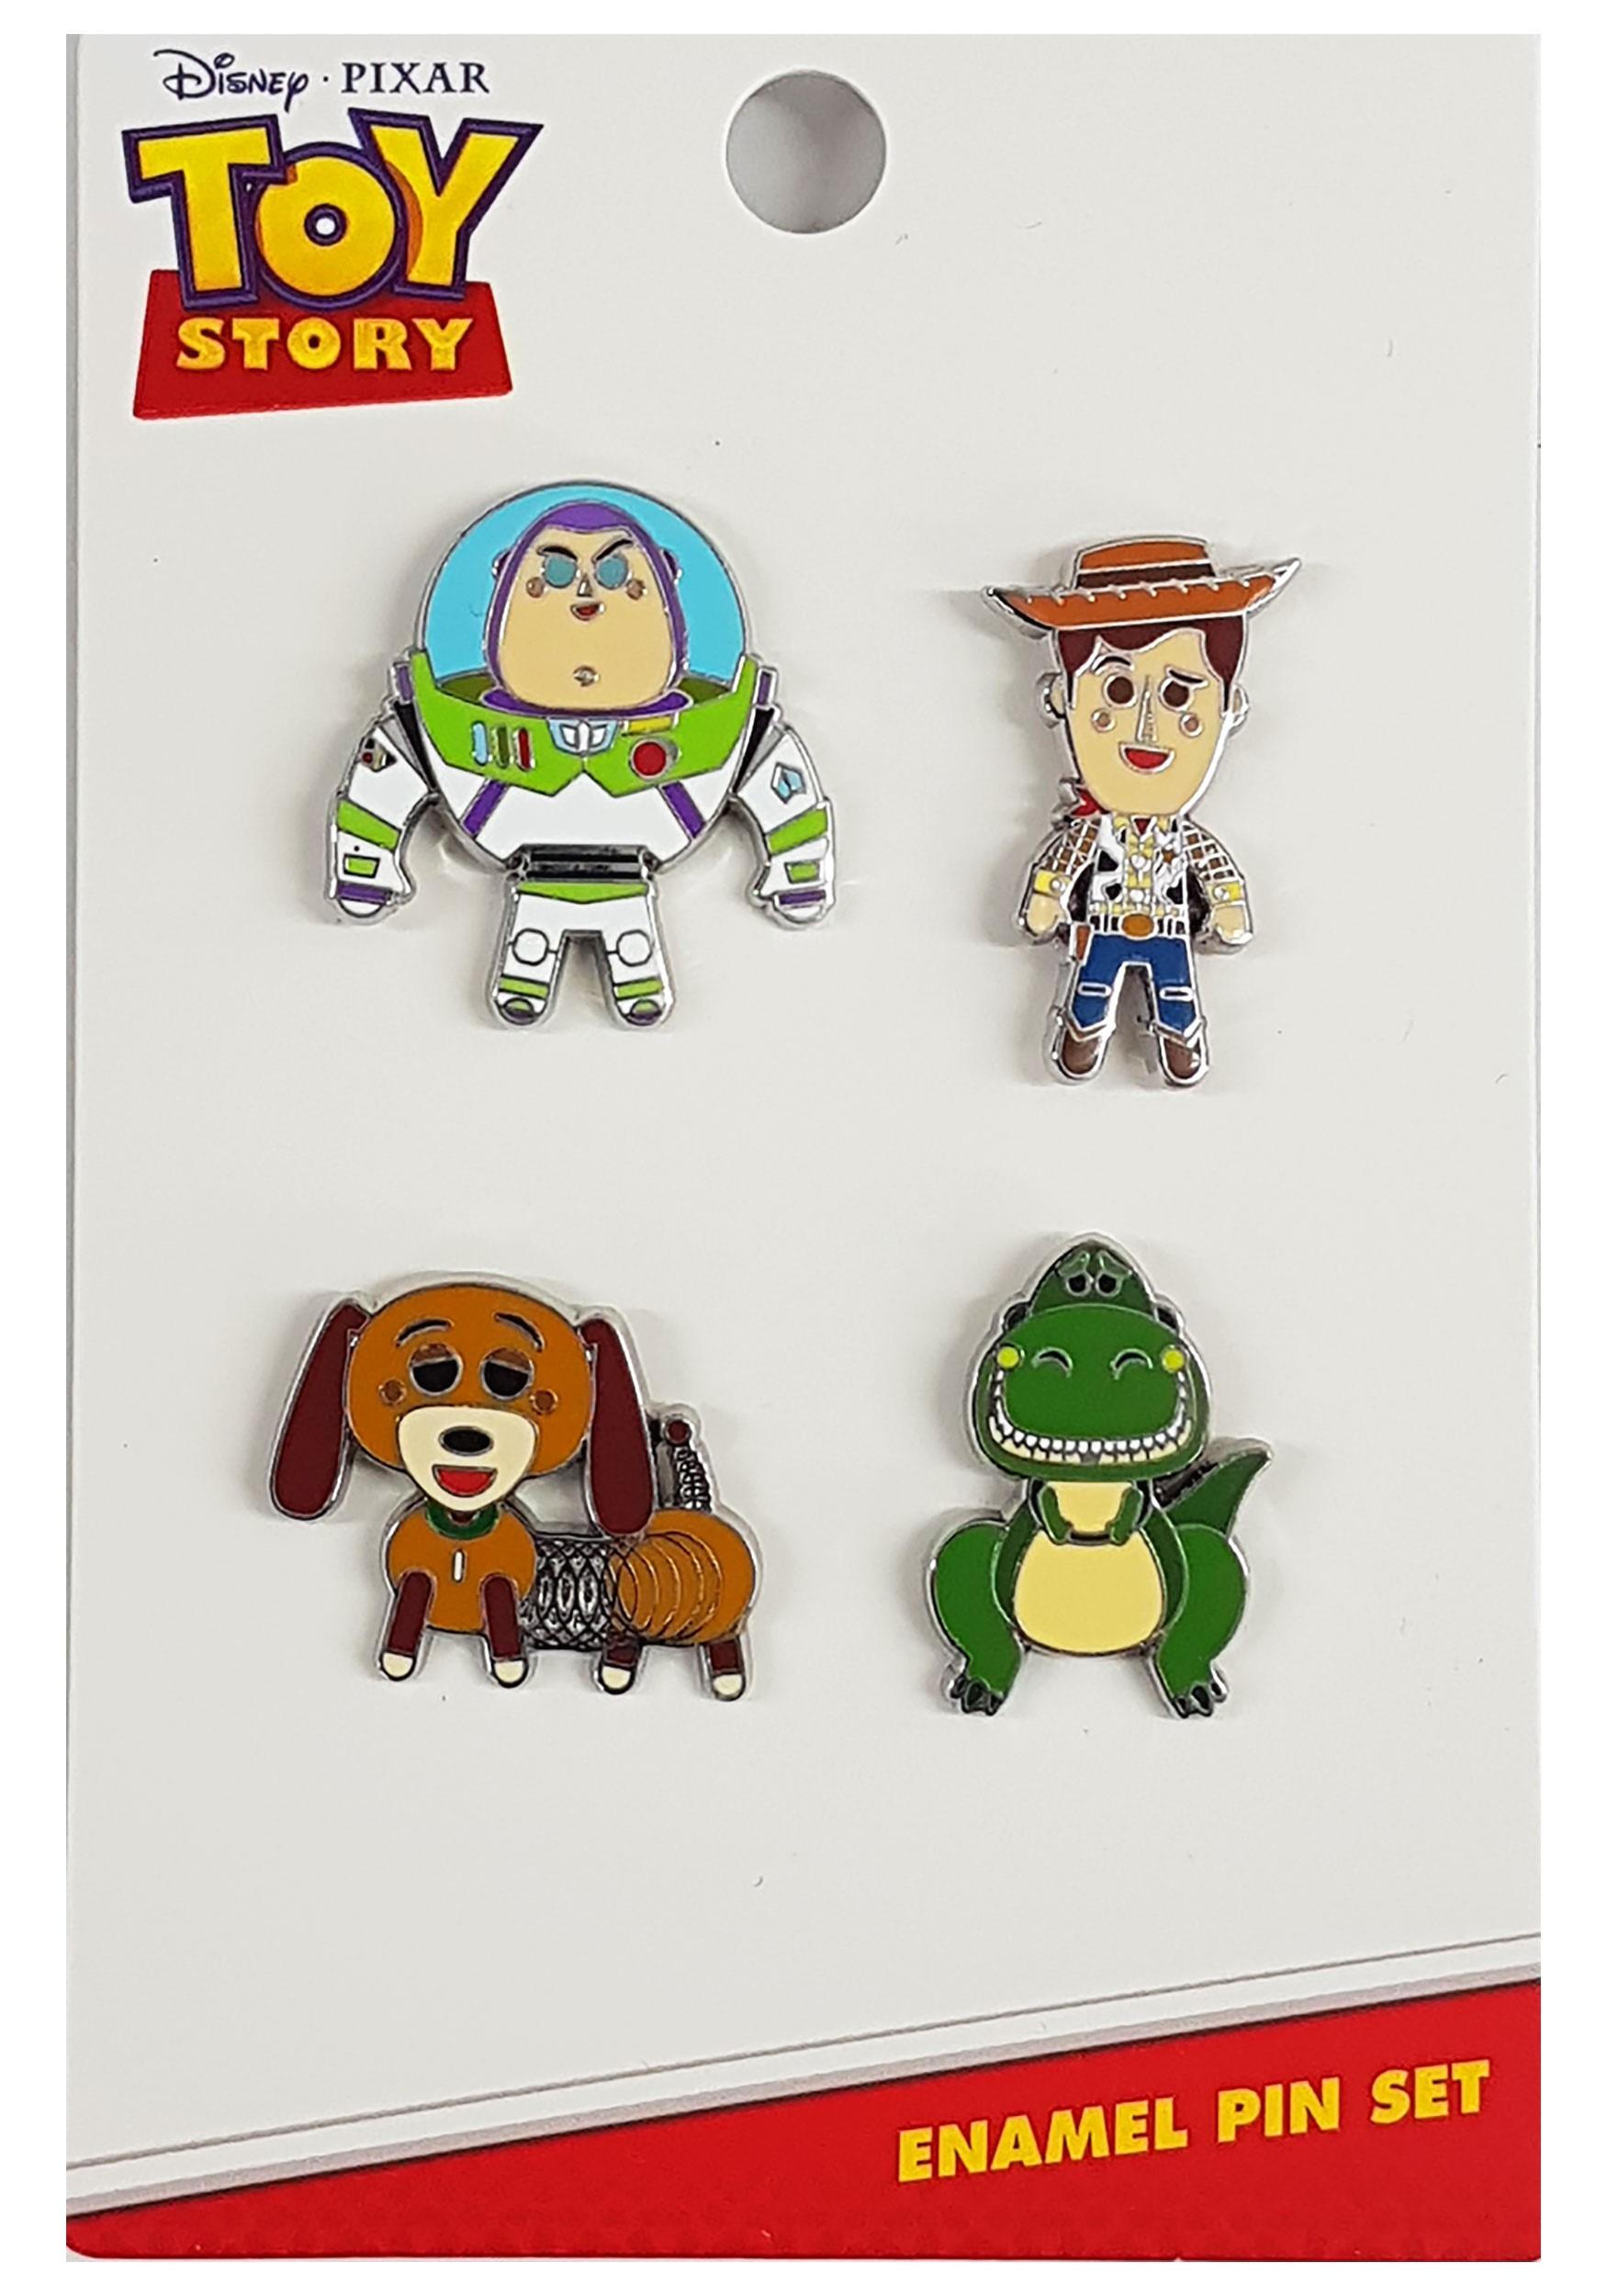 Disney SDR Toy Story Rex Pin